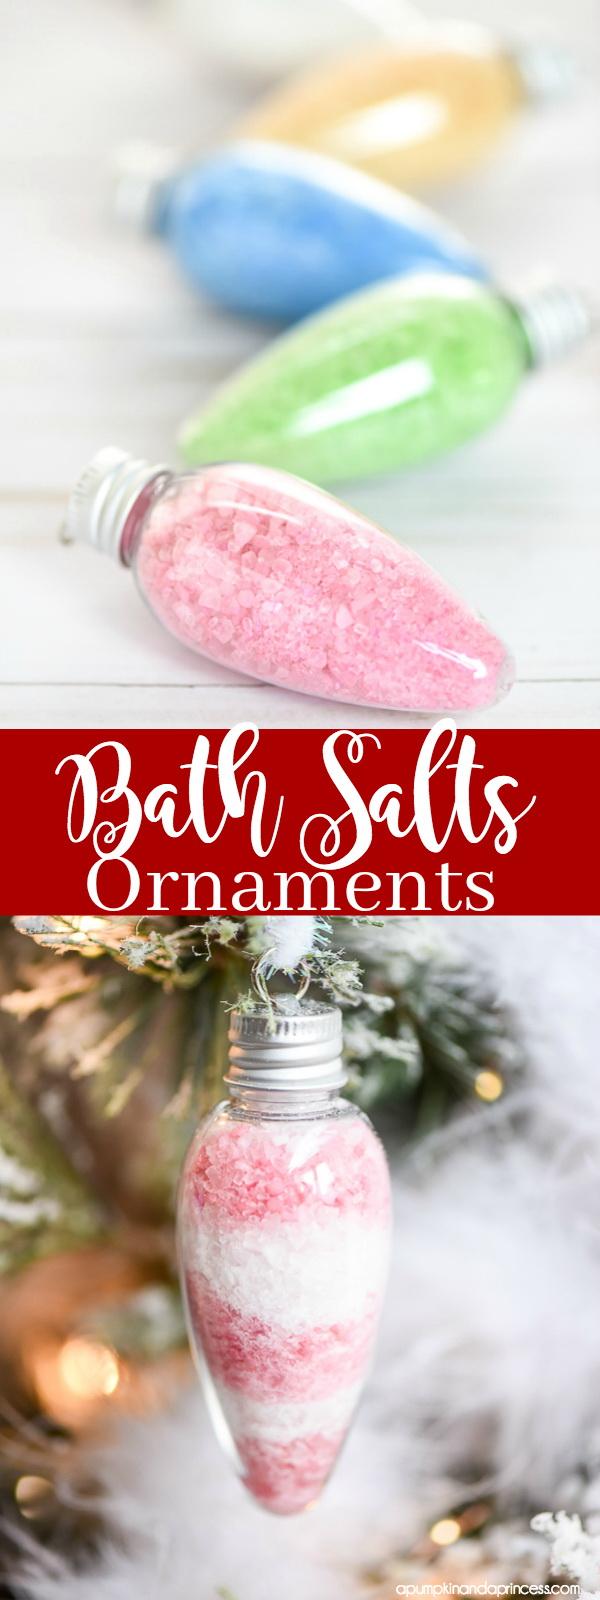 Bath Salts Ornaments.